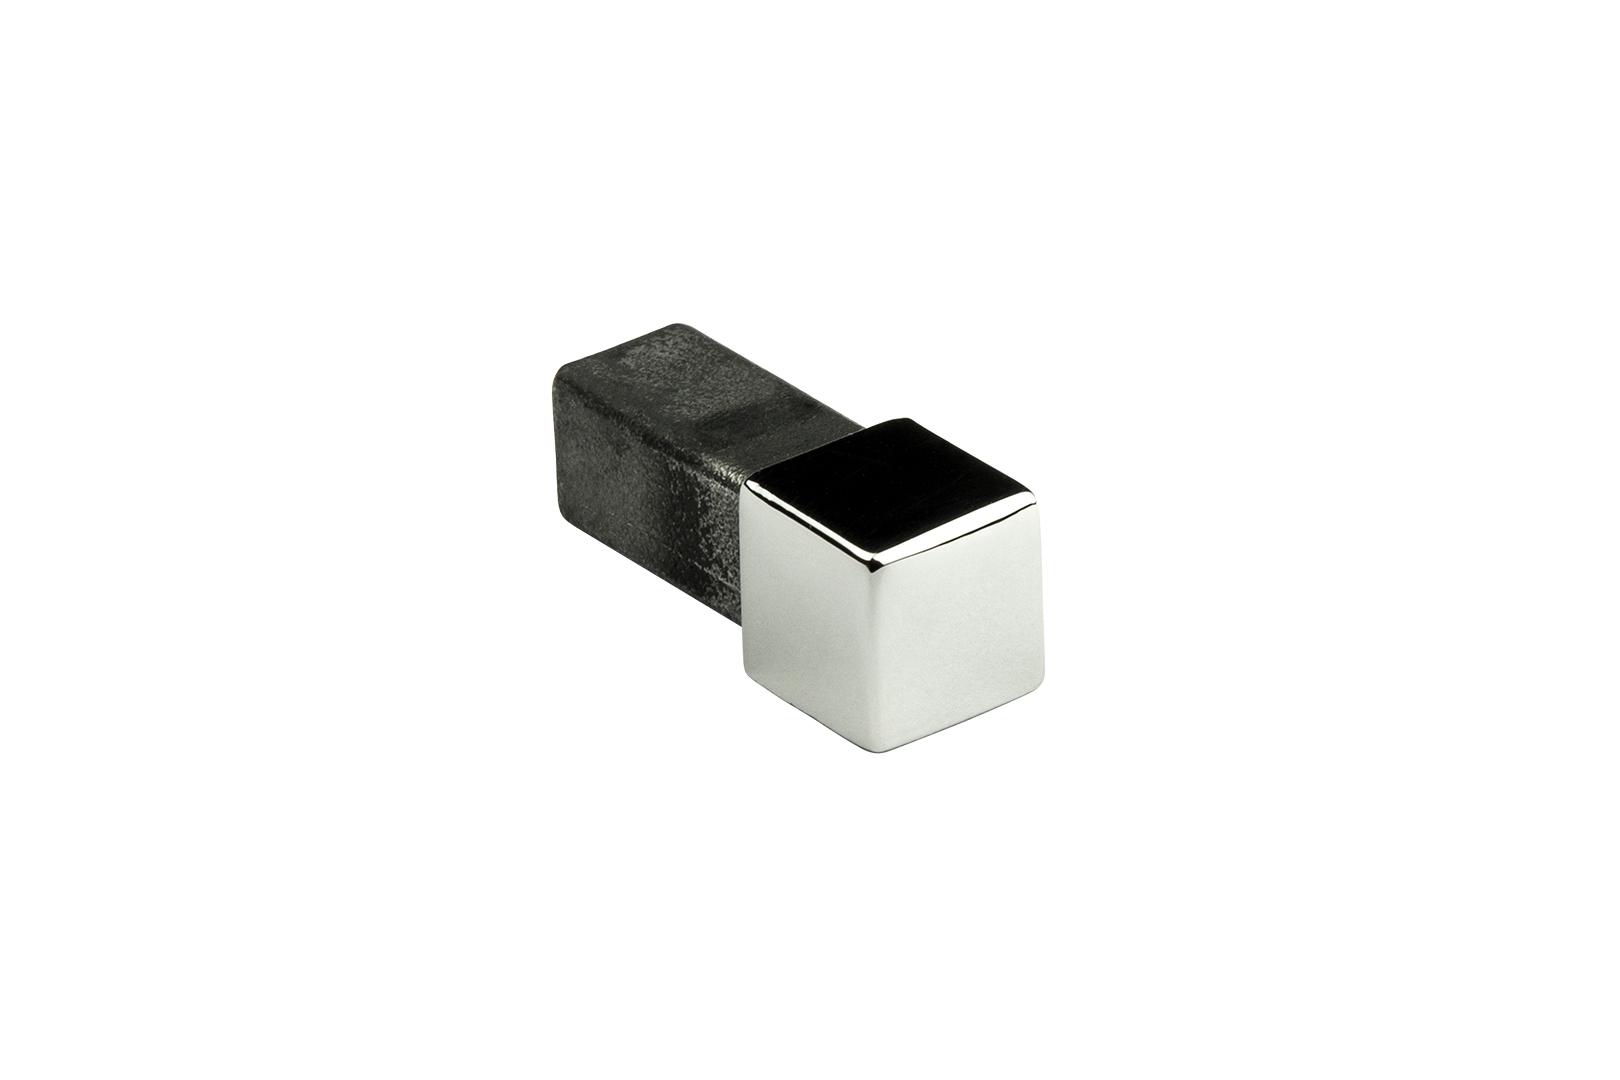 Eckstück   Quadrat   Edelstahl   Hexim   10-12mm   HEX401